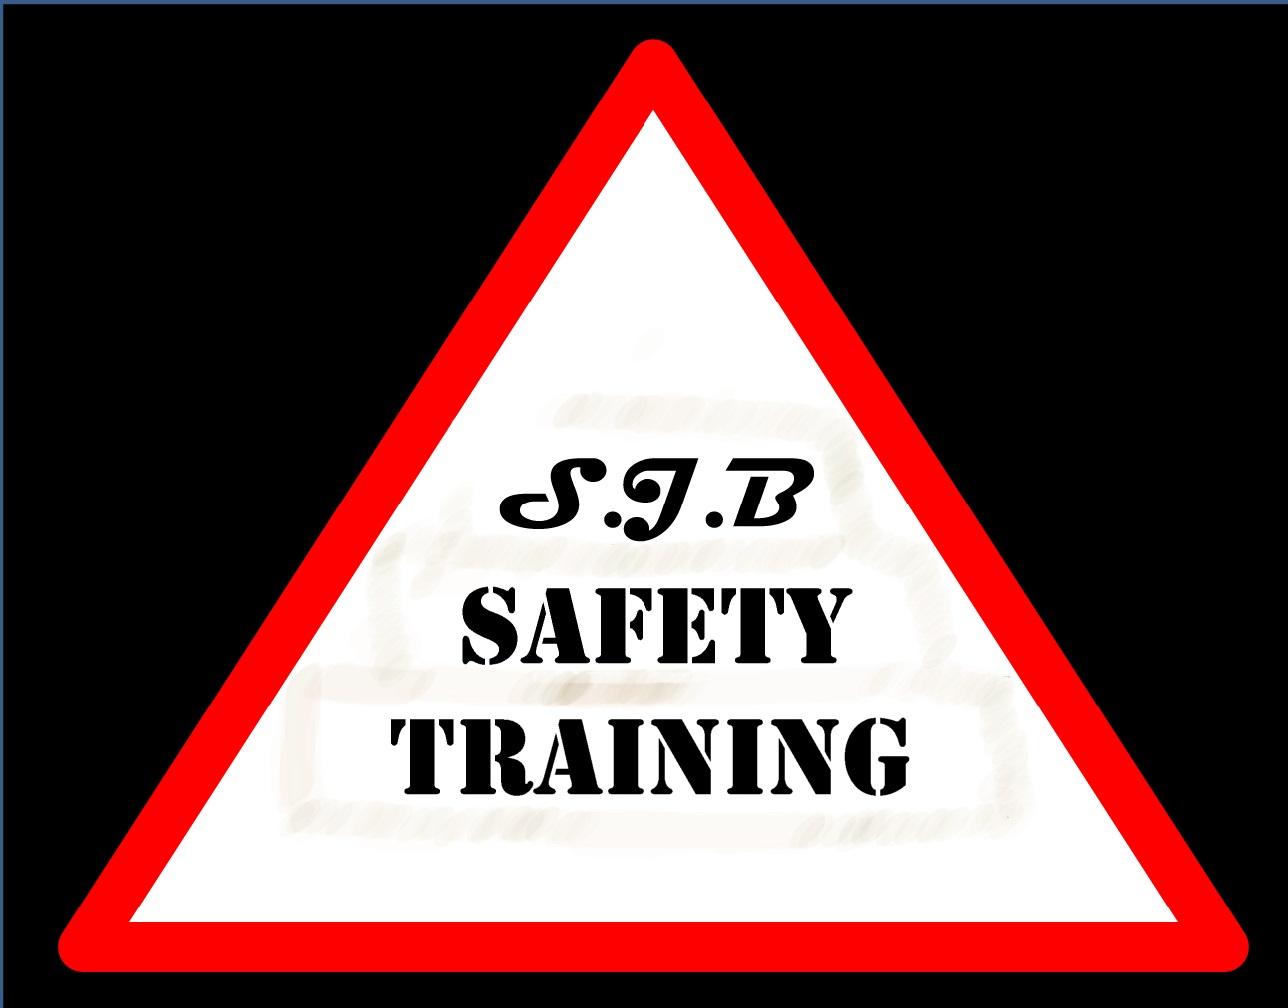 S.J.B. Safety Training